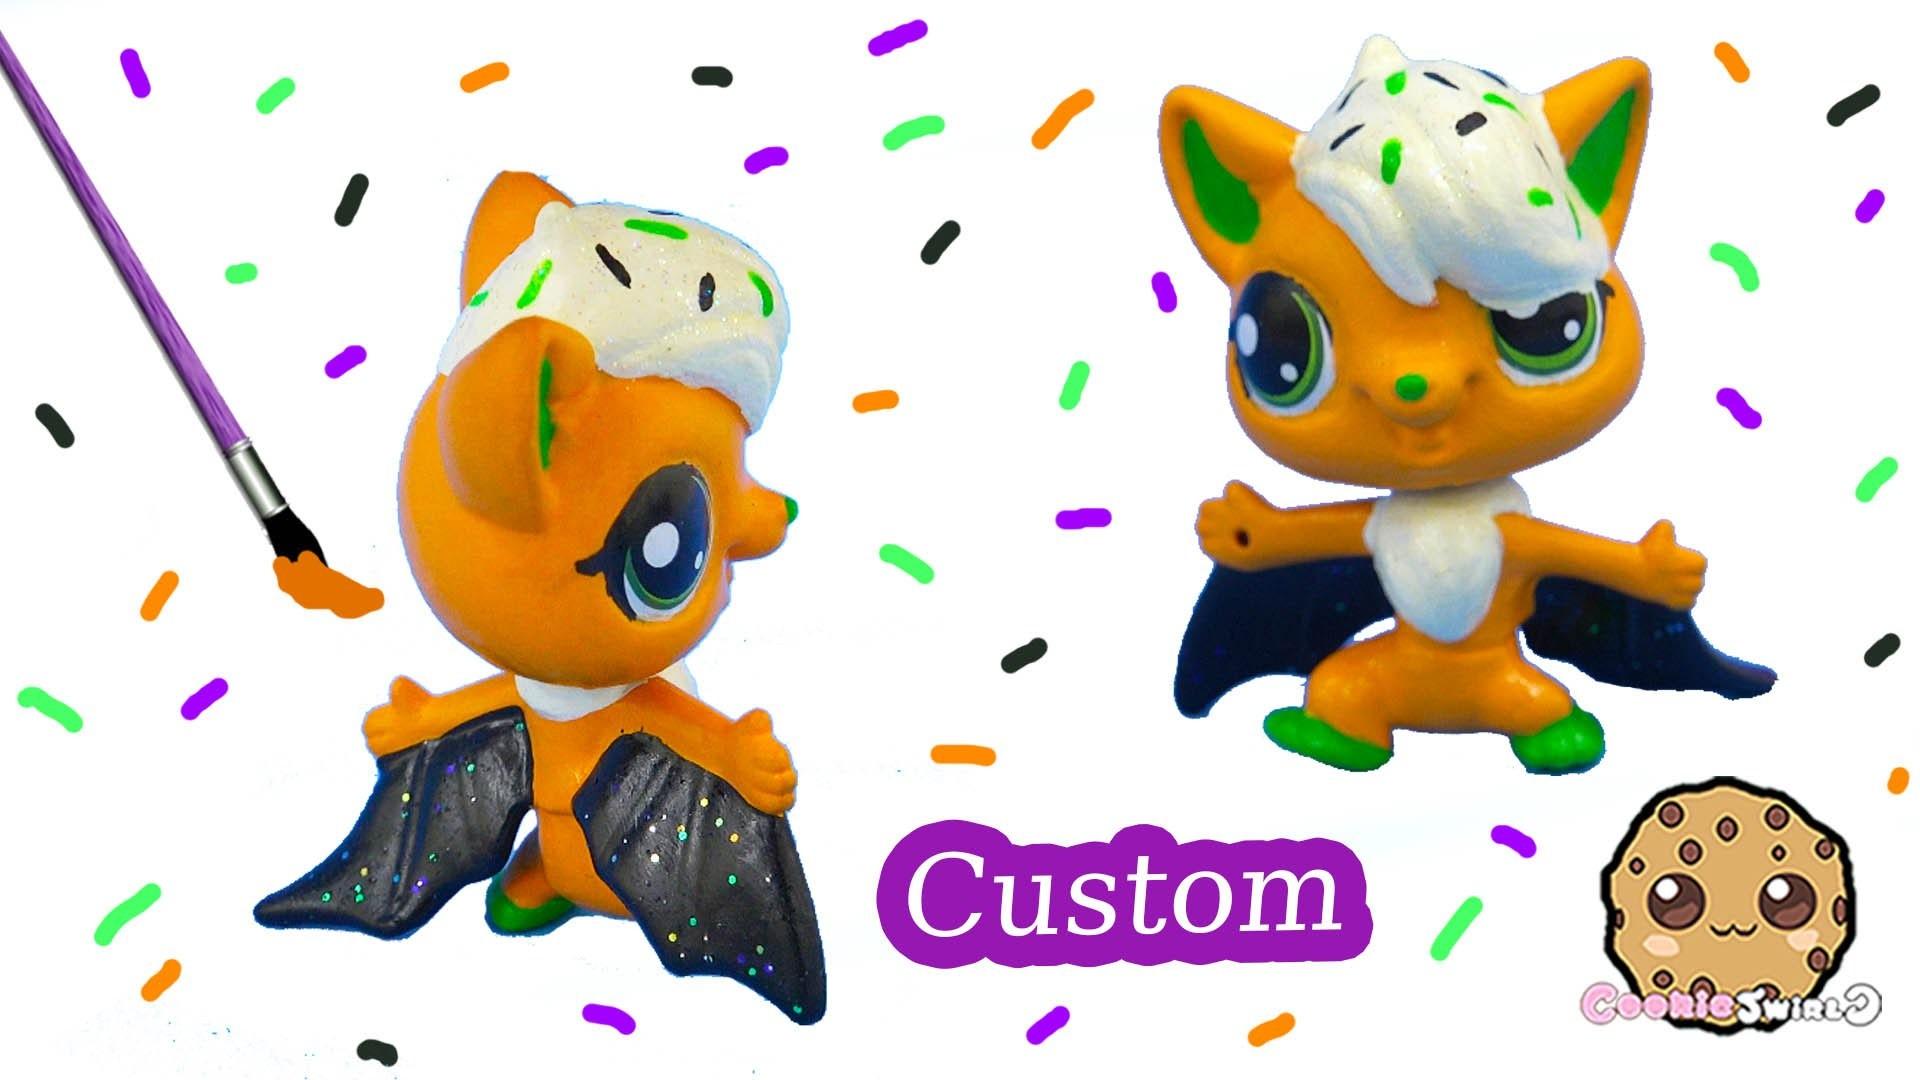 DIY Littlest Pet Shop Custom Cupcake Halloween Inspired LPS Bat Painted Craft Toy Cookieswirlc